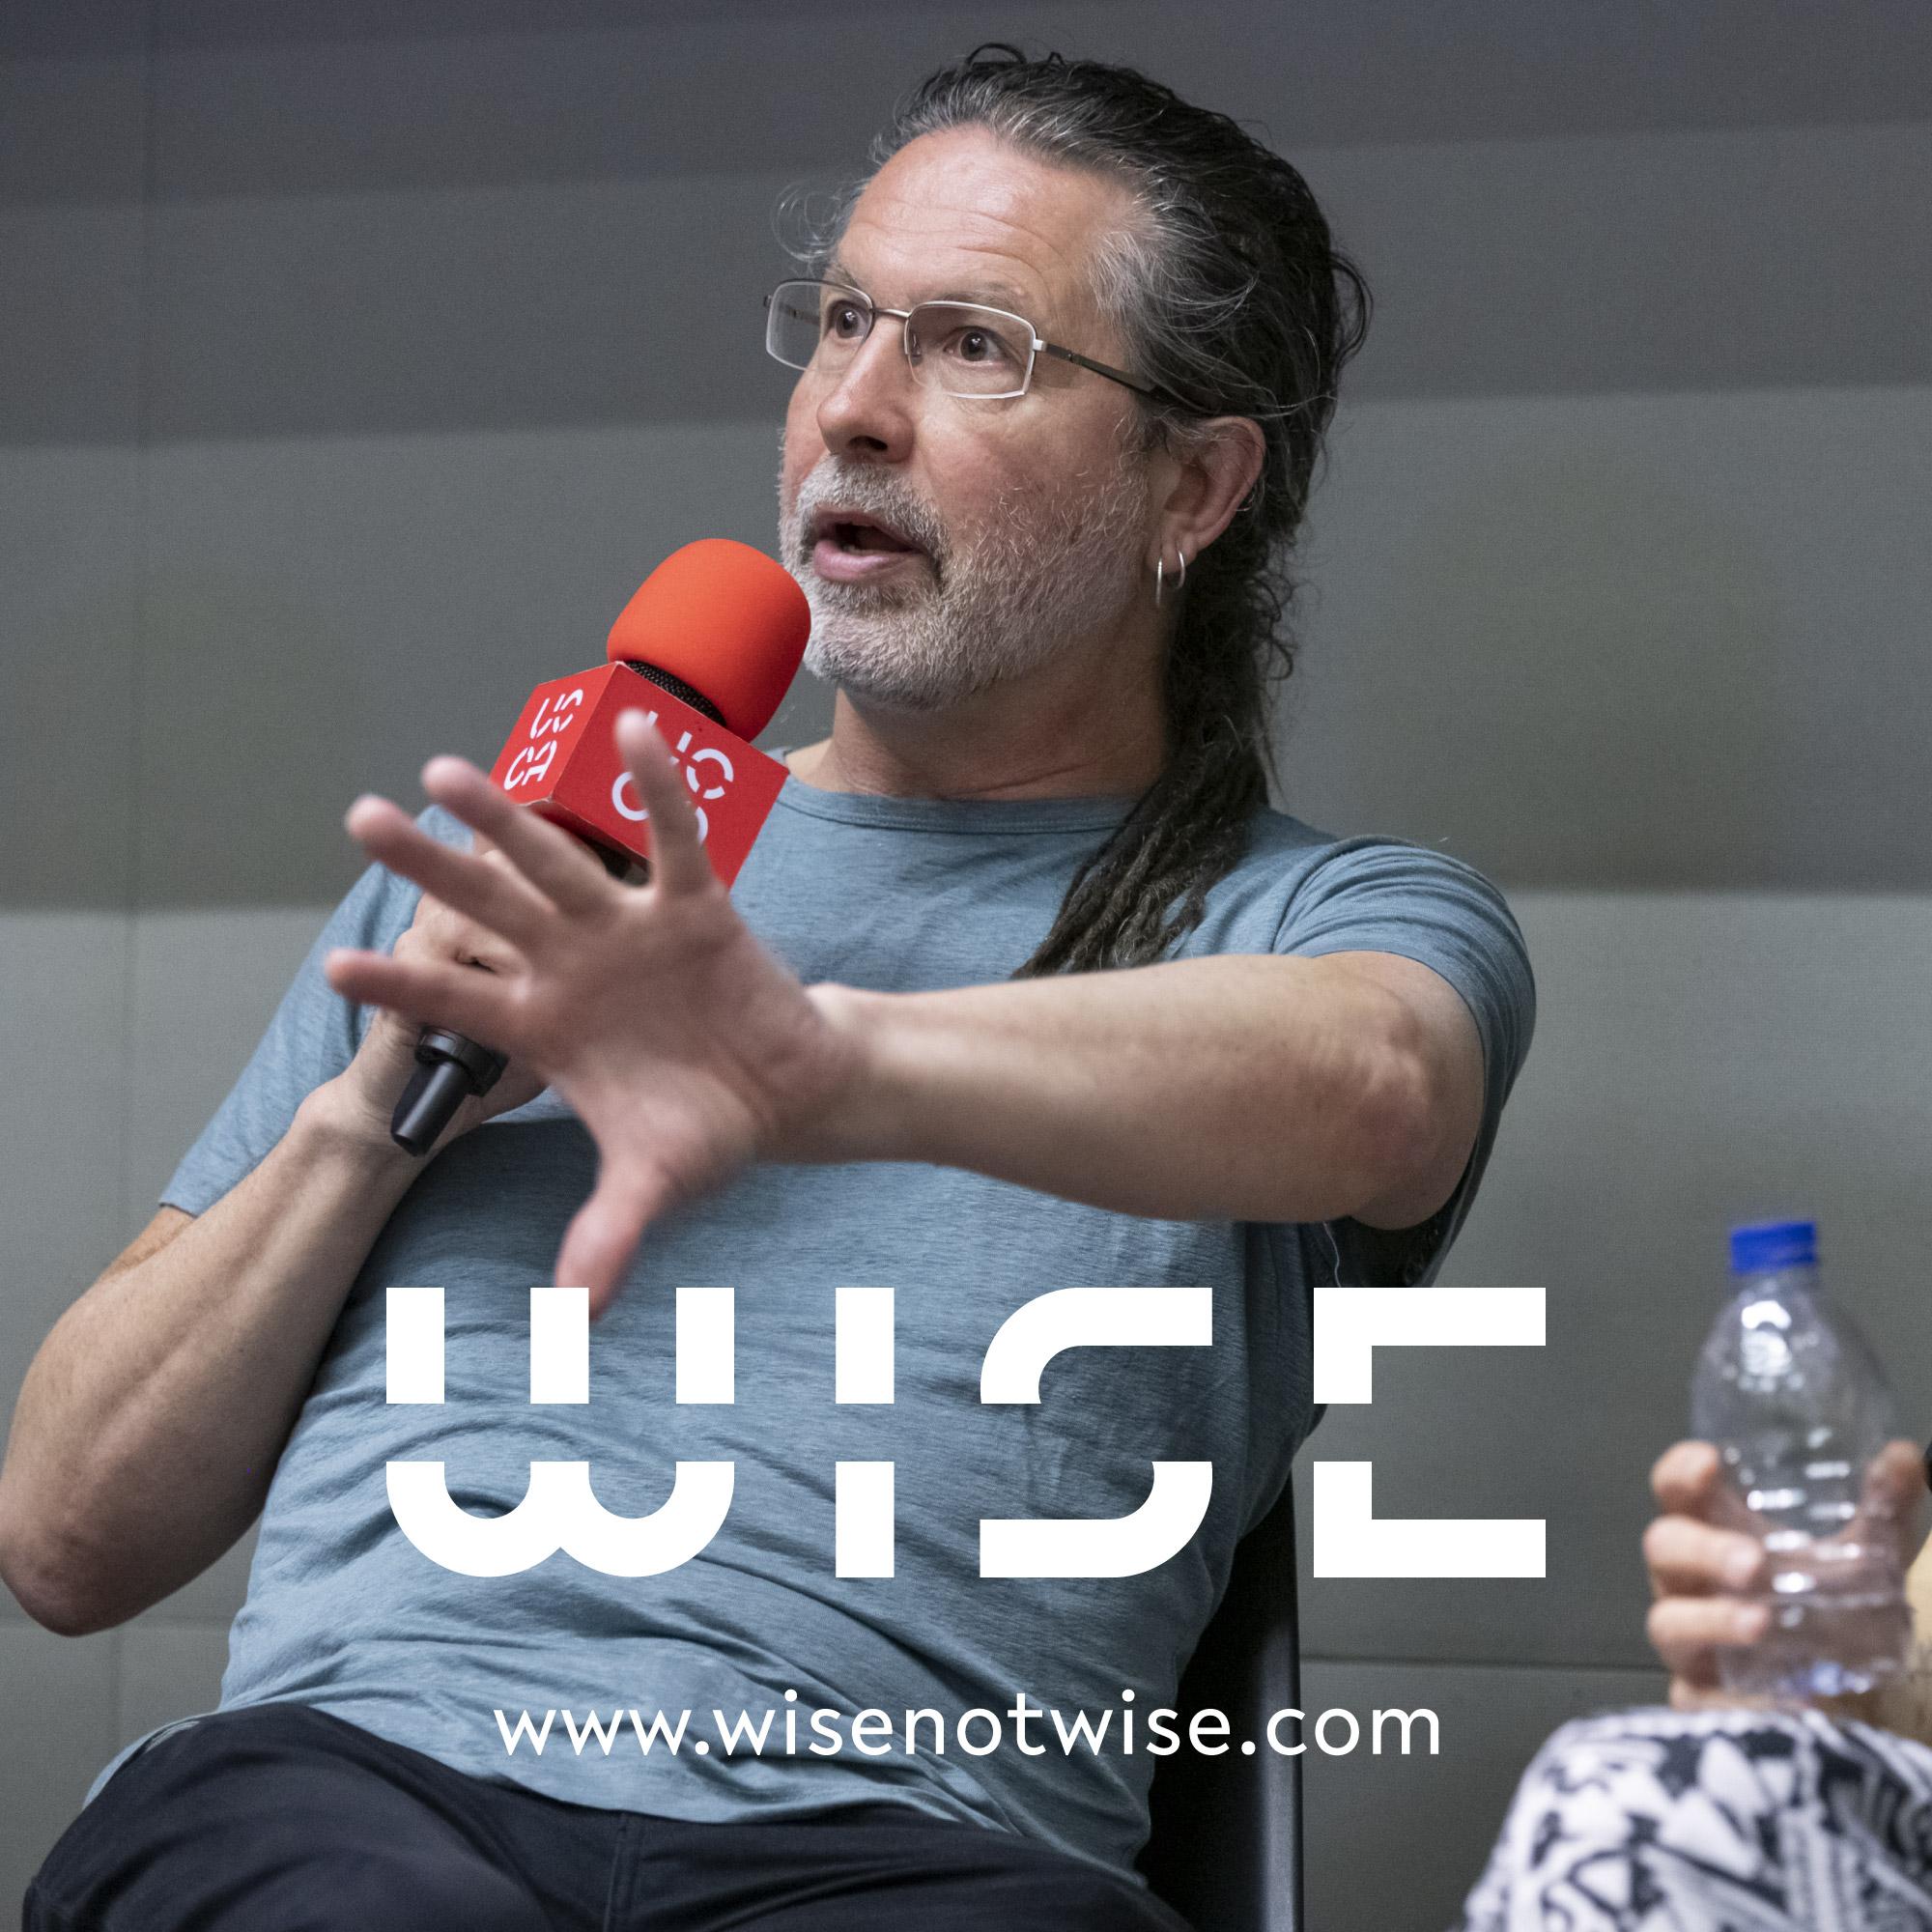 WISE_RECAP_2019_DAY_1_37.jpg